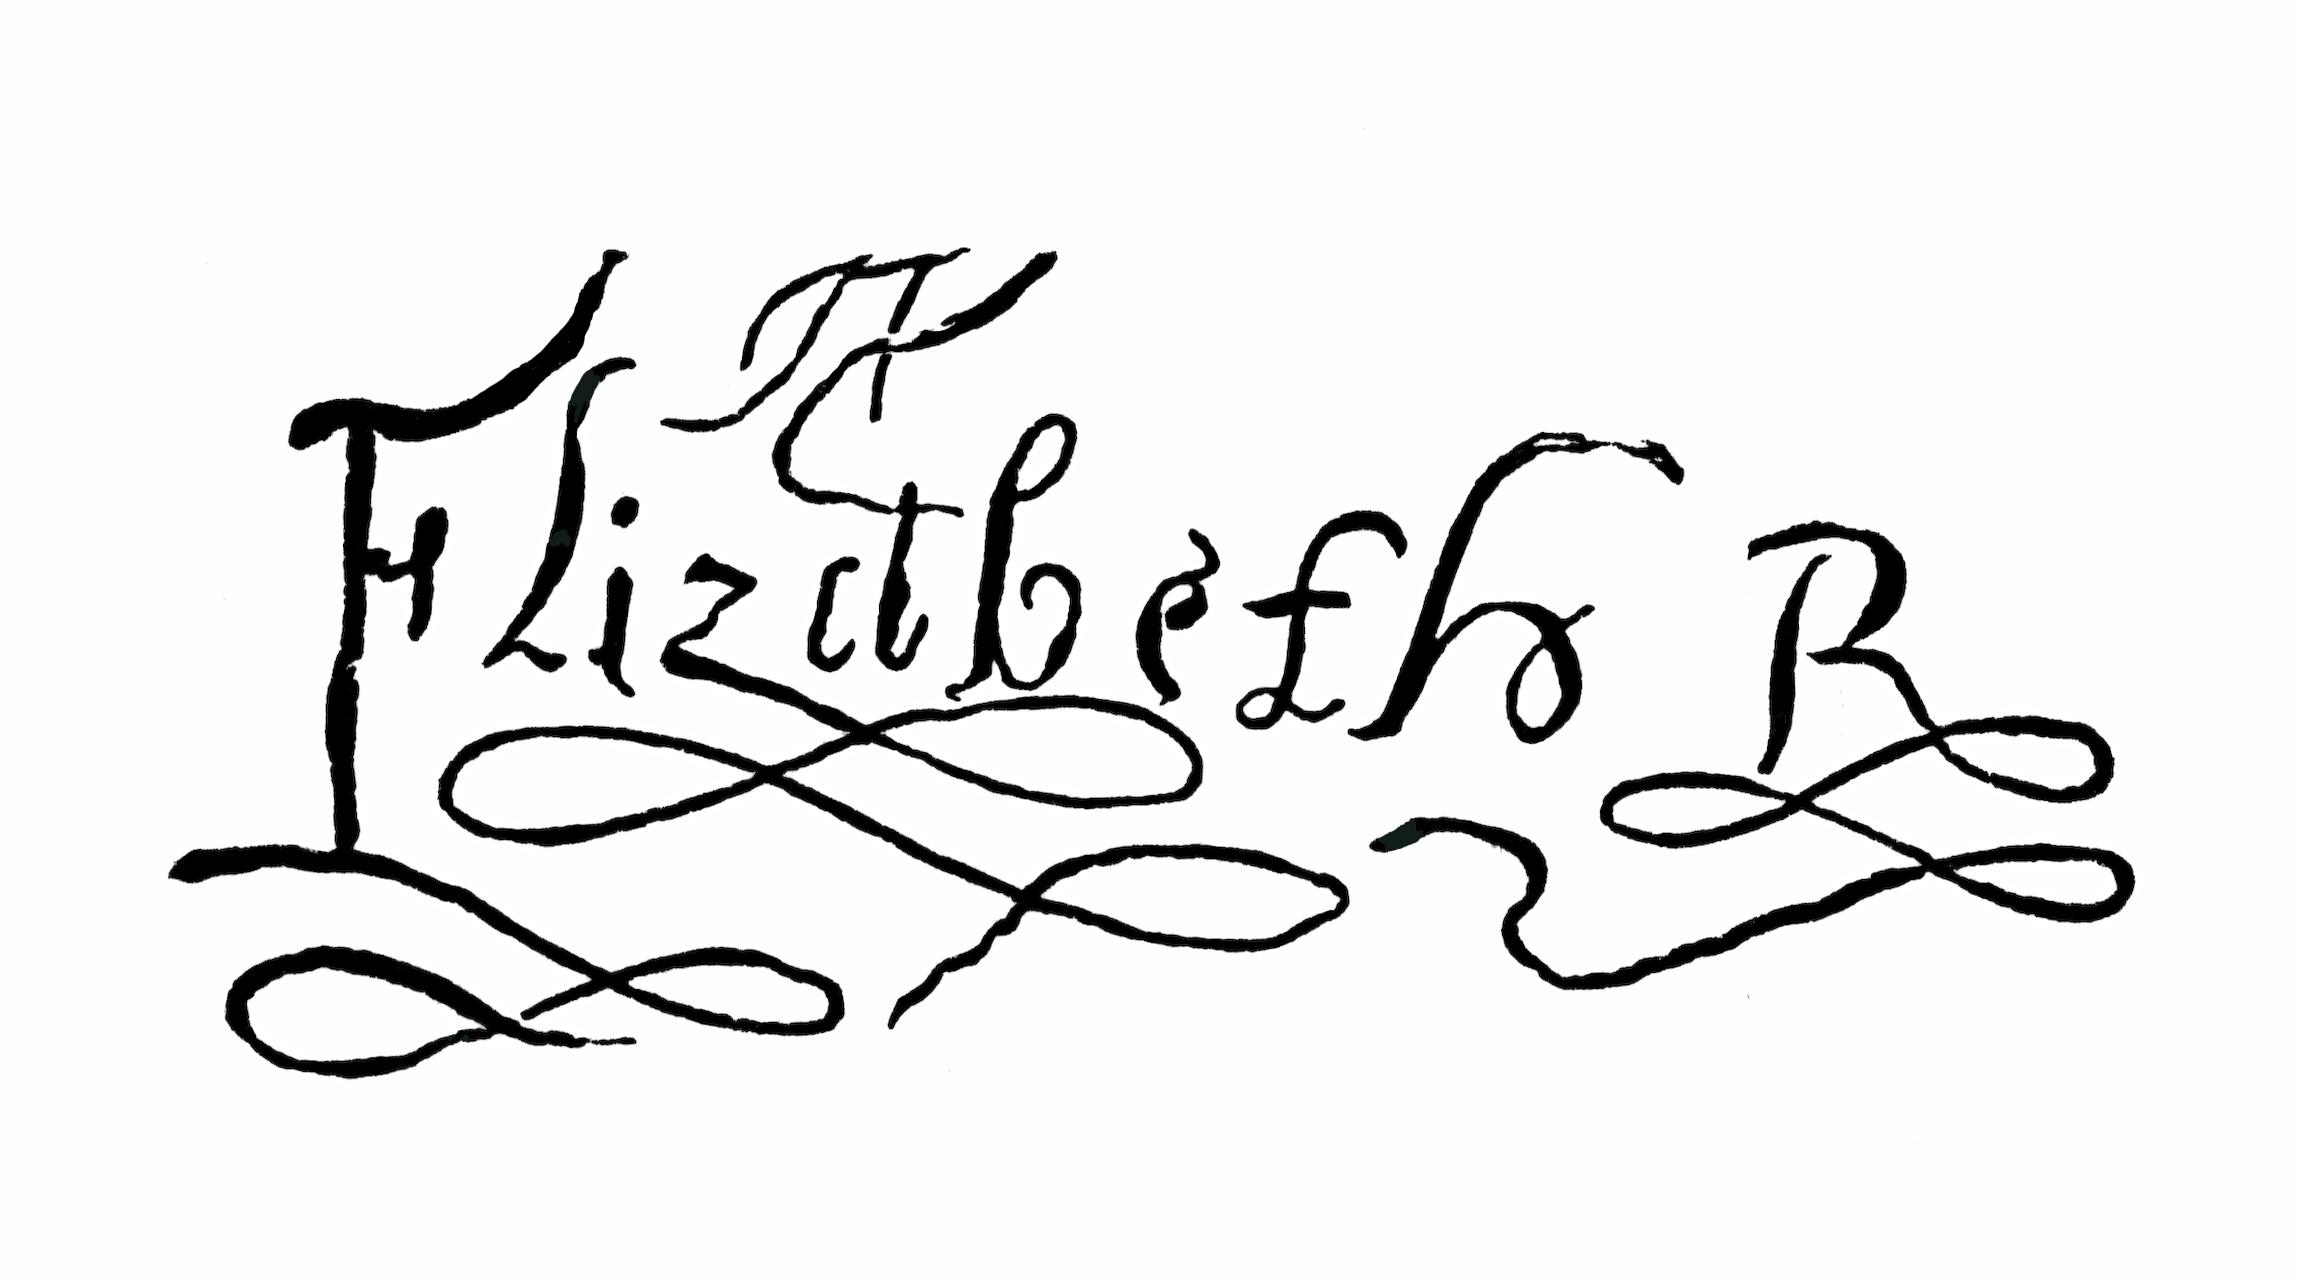 John murphy tudor historian and writer page 5 for Tudor signatures